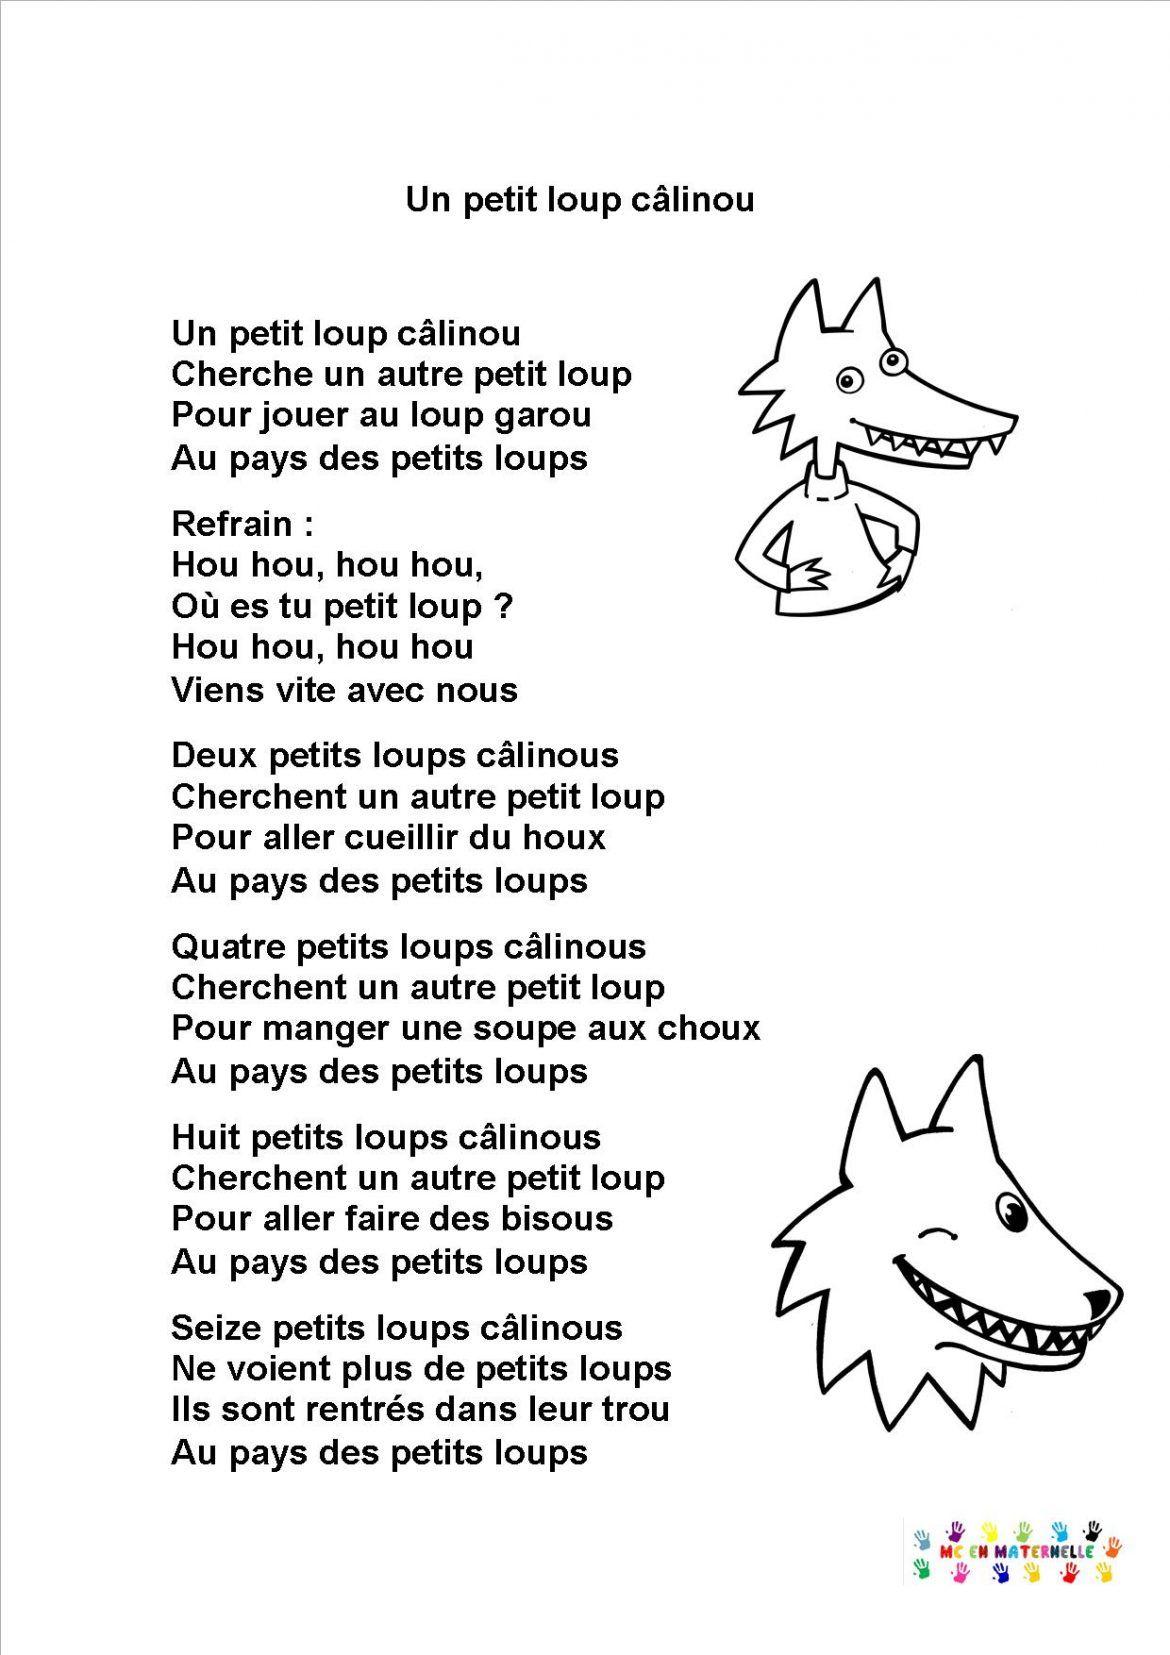 Croque monsieur vol 2 vf - 4 7